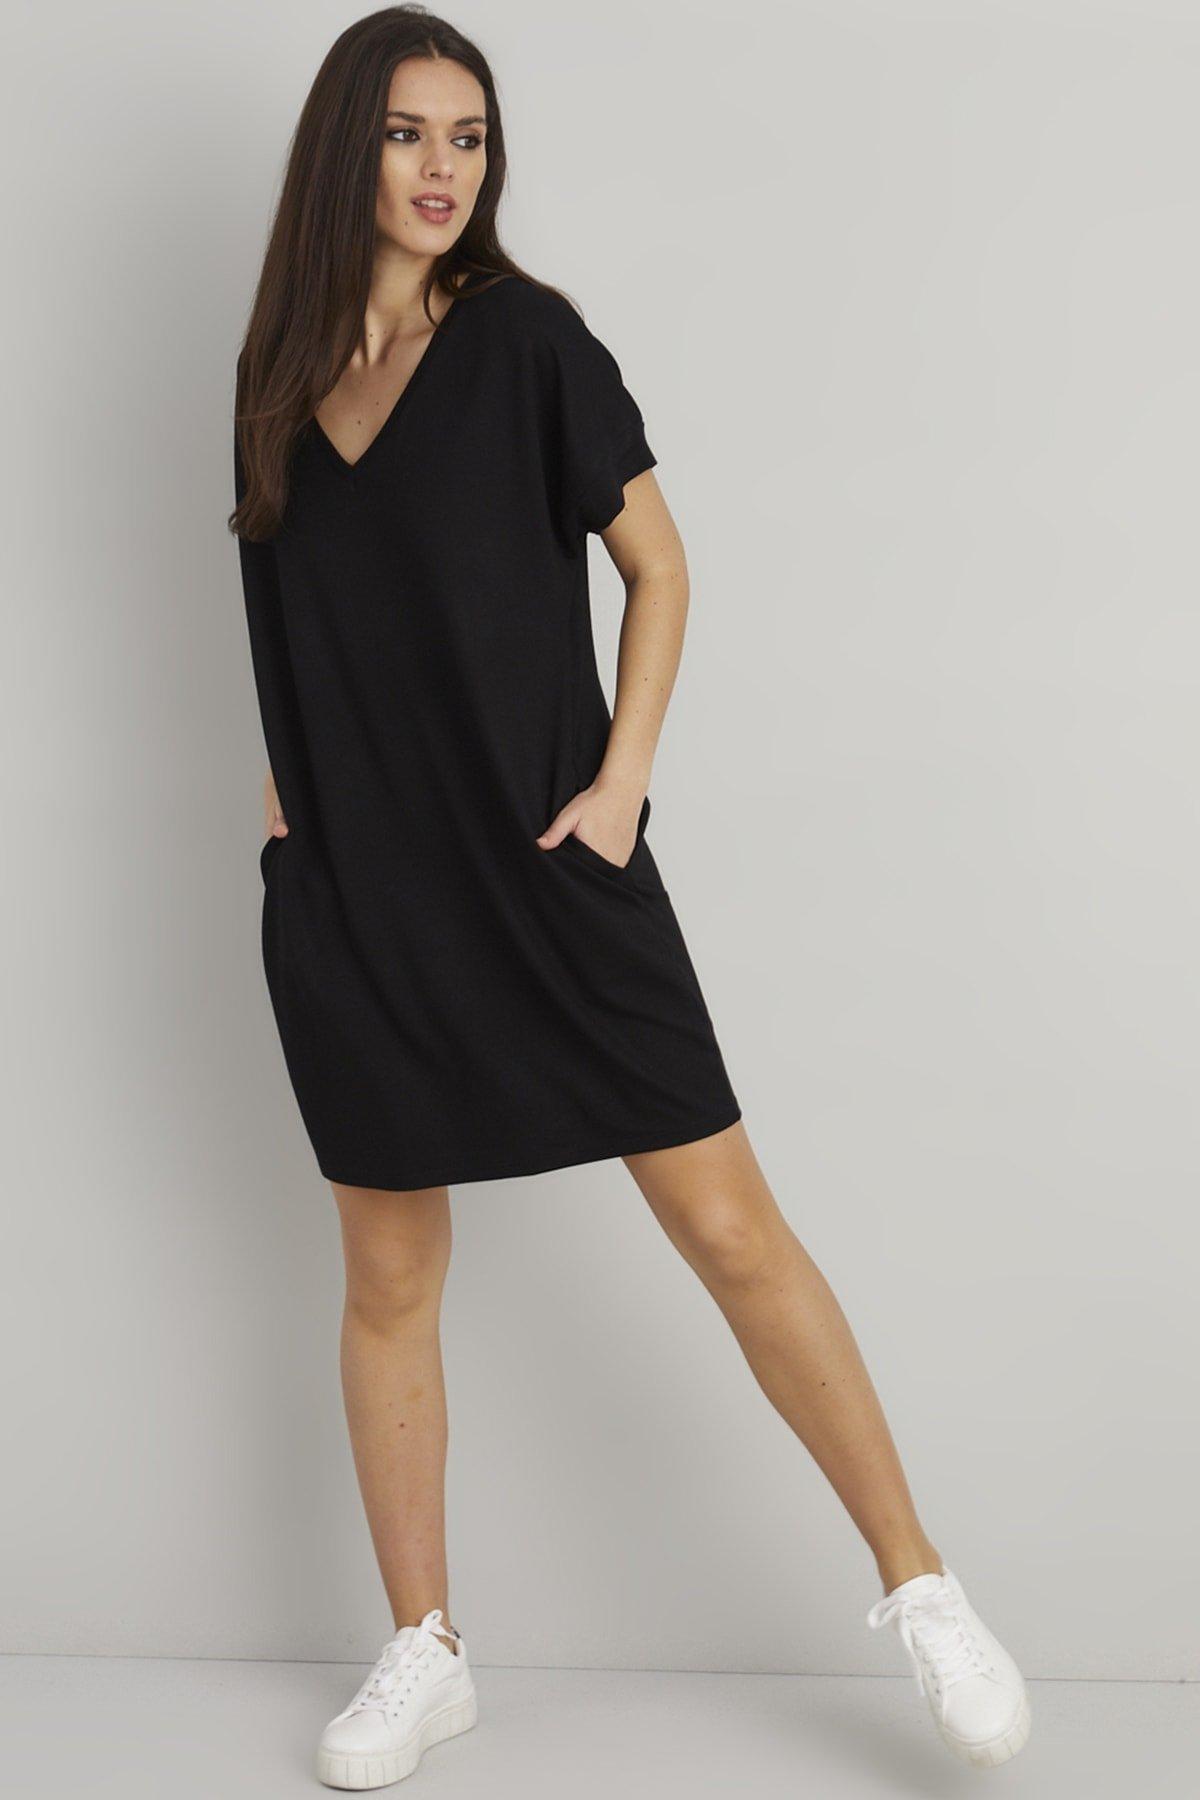 Cool & Sexy Siyah Sırt Baskılı Cepli Mini T-shirt Elbise